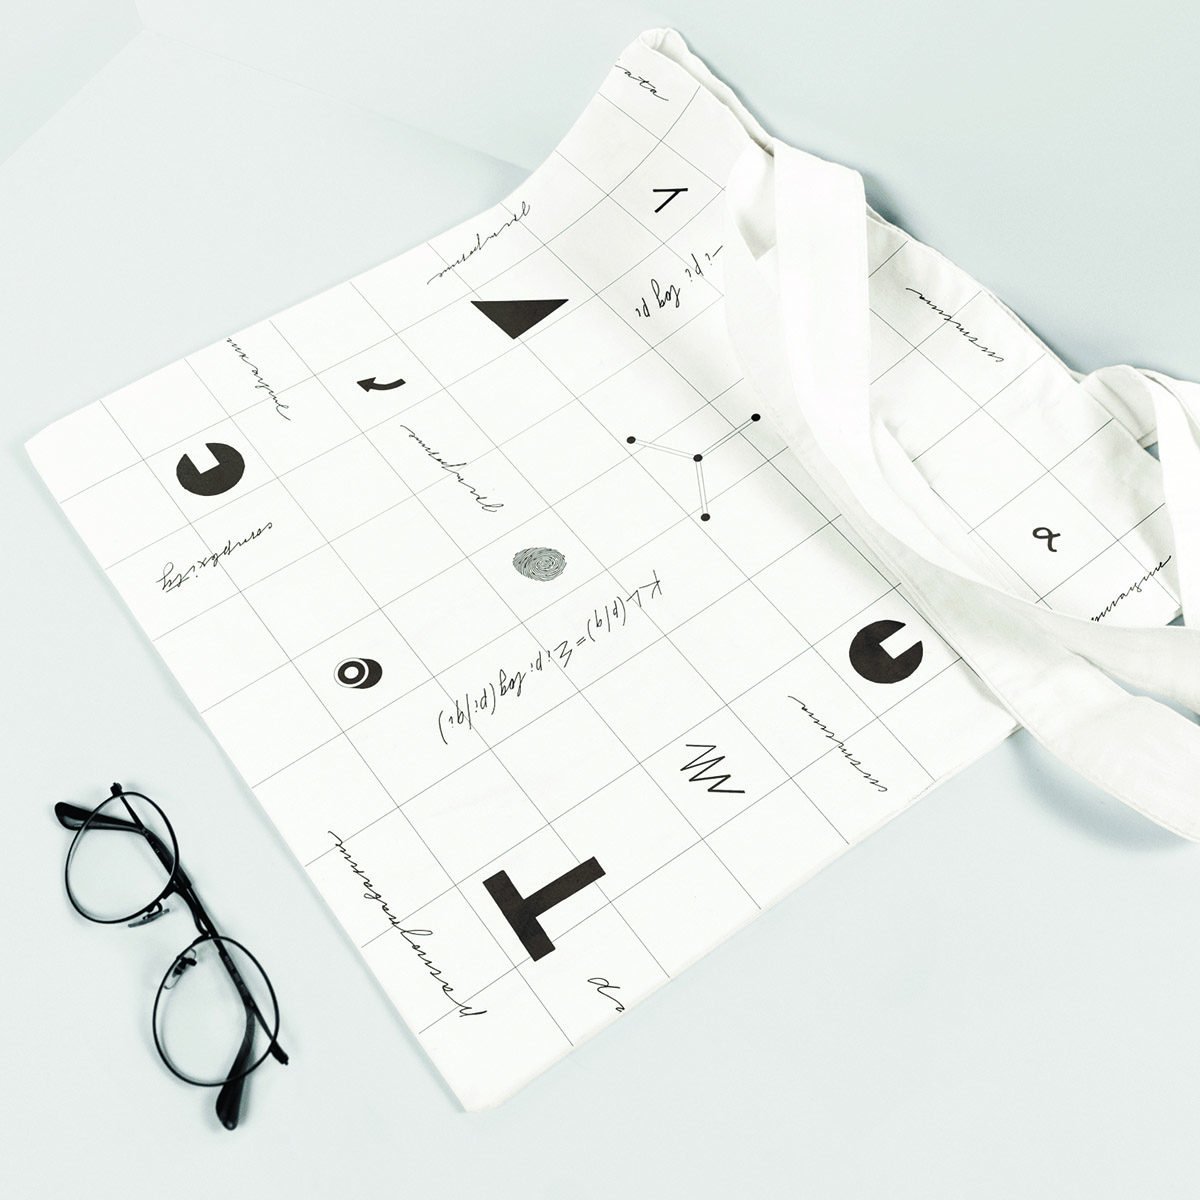 IITP Rebranding by Shuka - Creative Work - $i